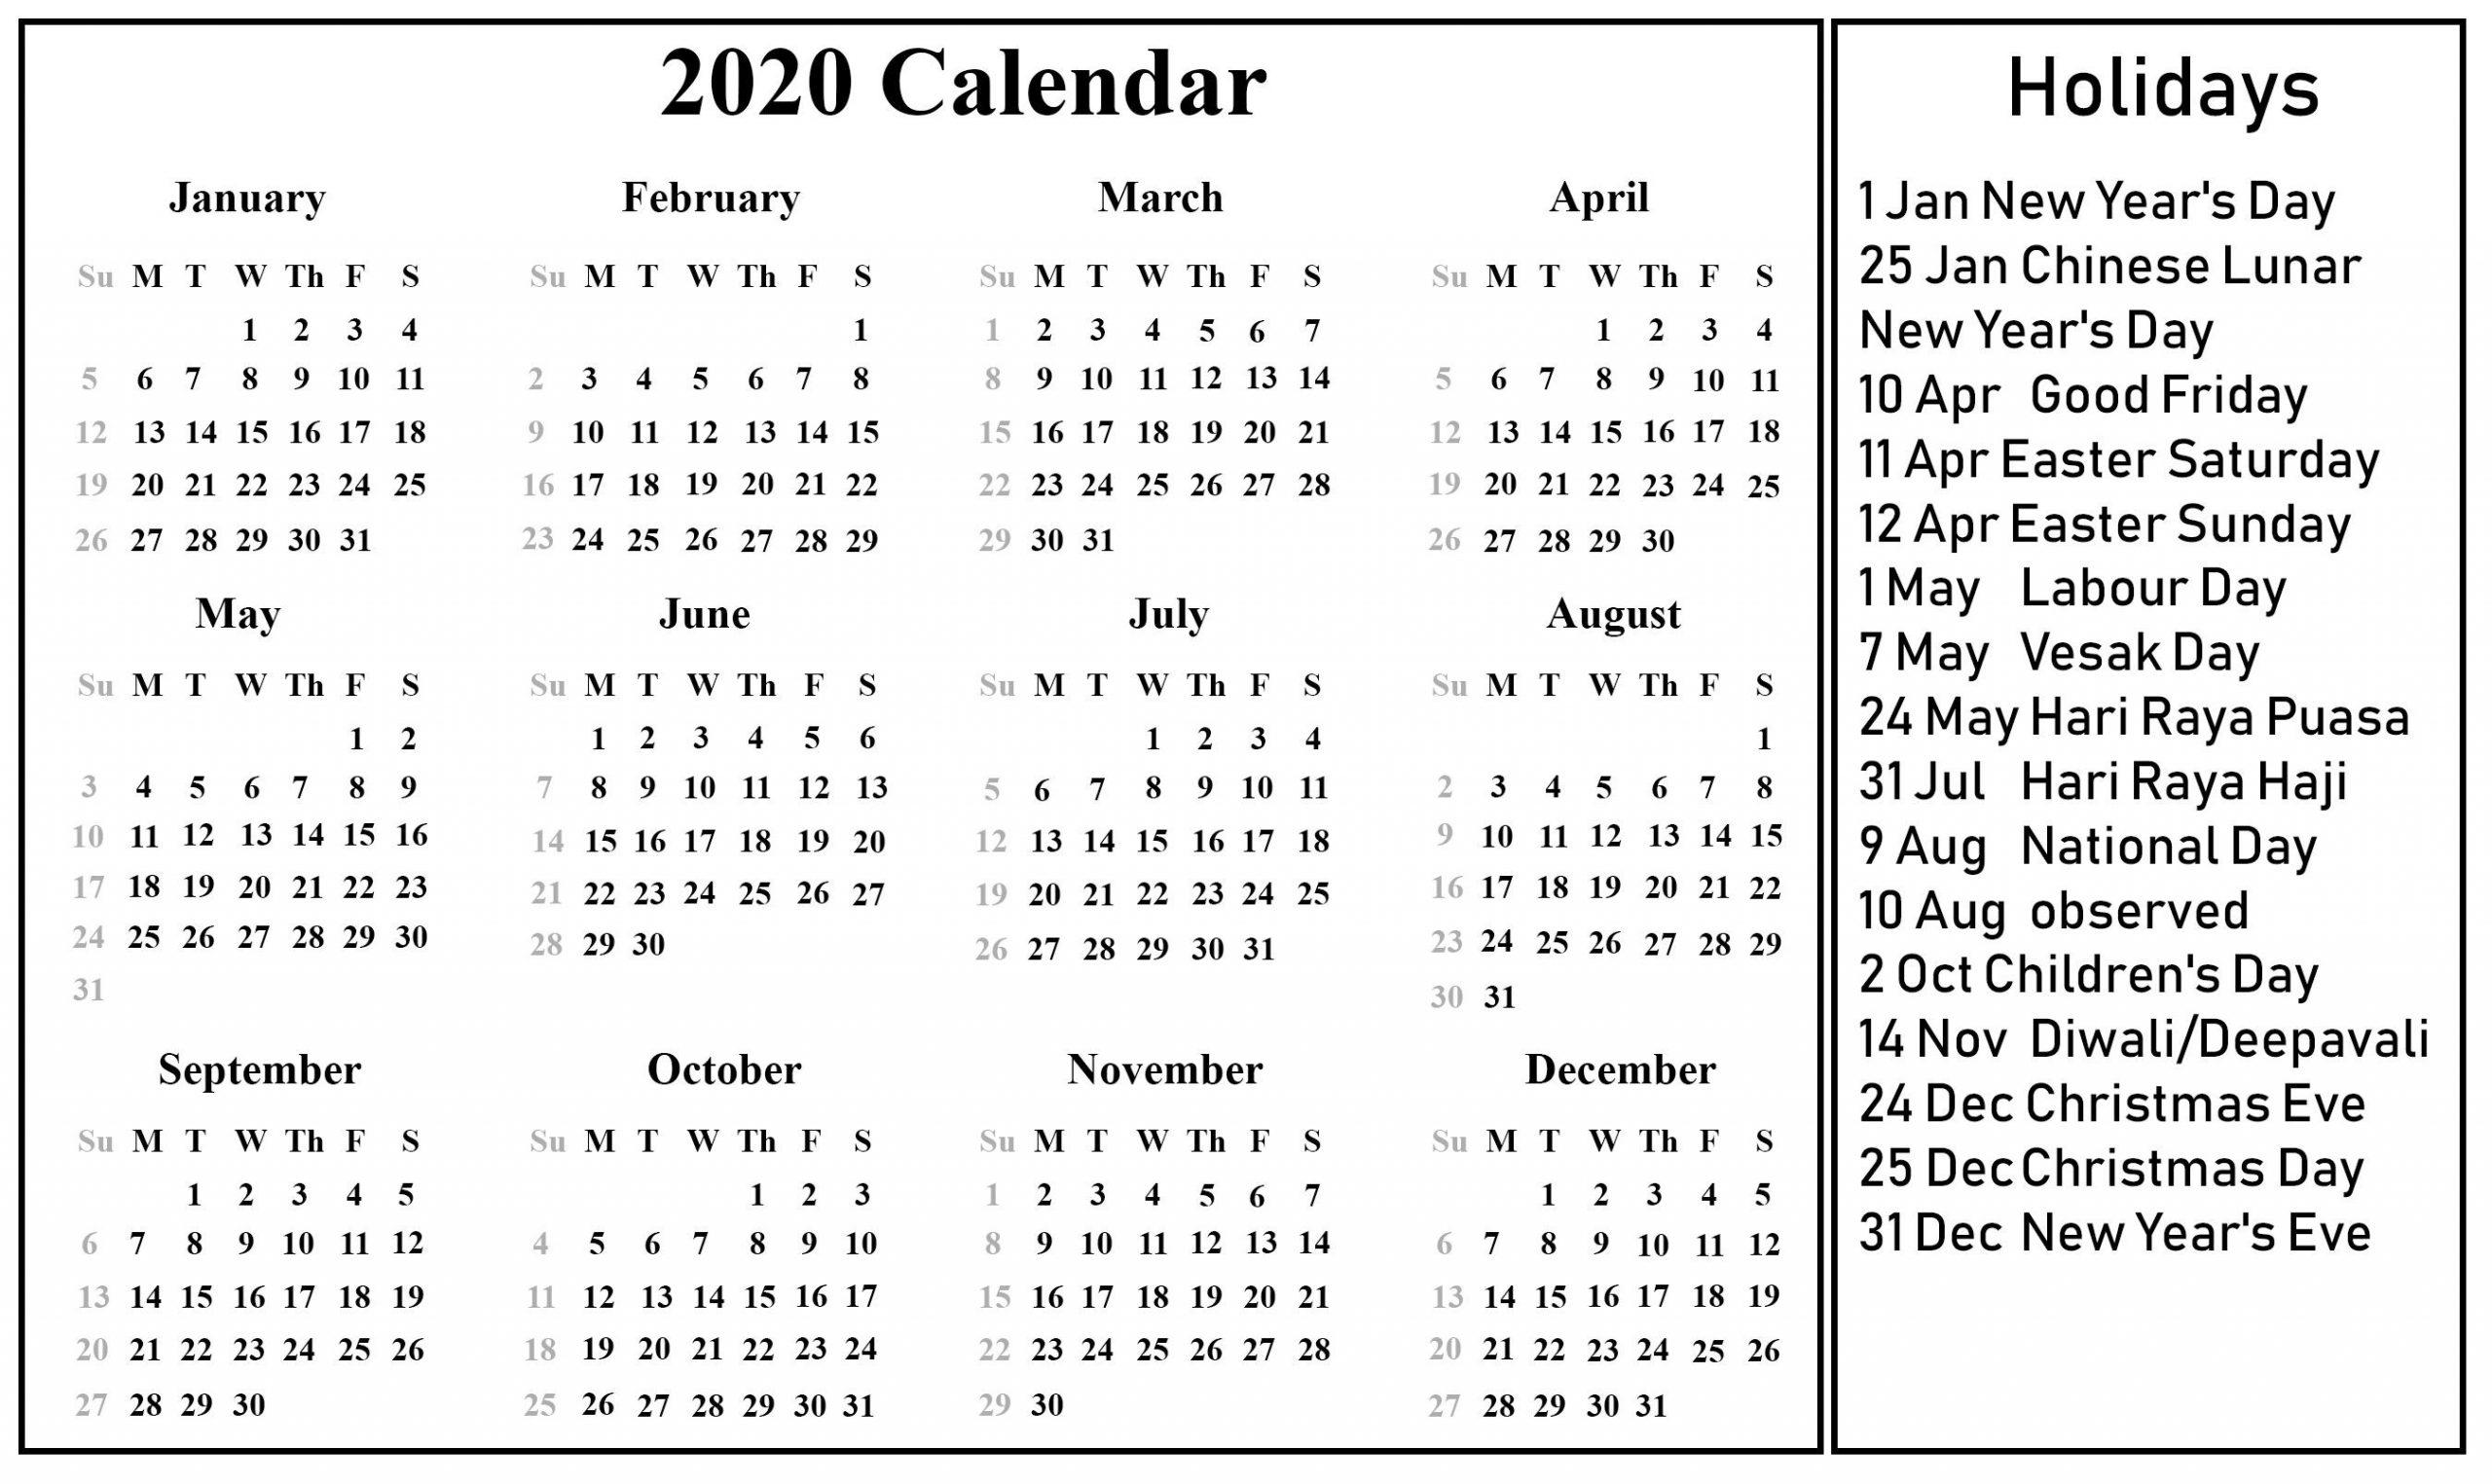 Impressive 2020 Calendar Holidays Sri Lanka | Holiday-2021 Calender With Mercantile Holidays